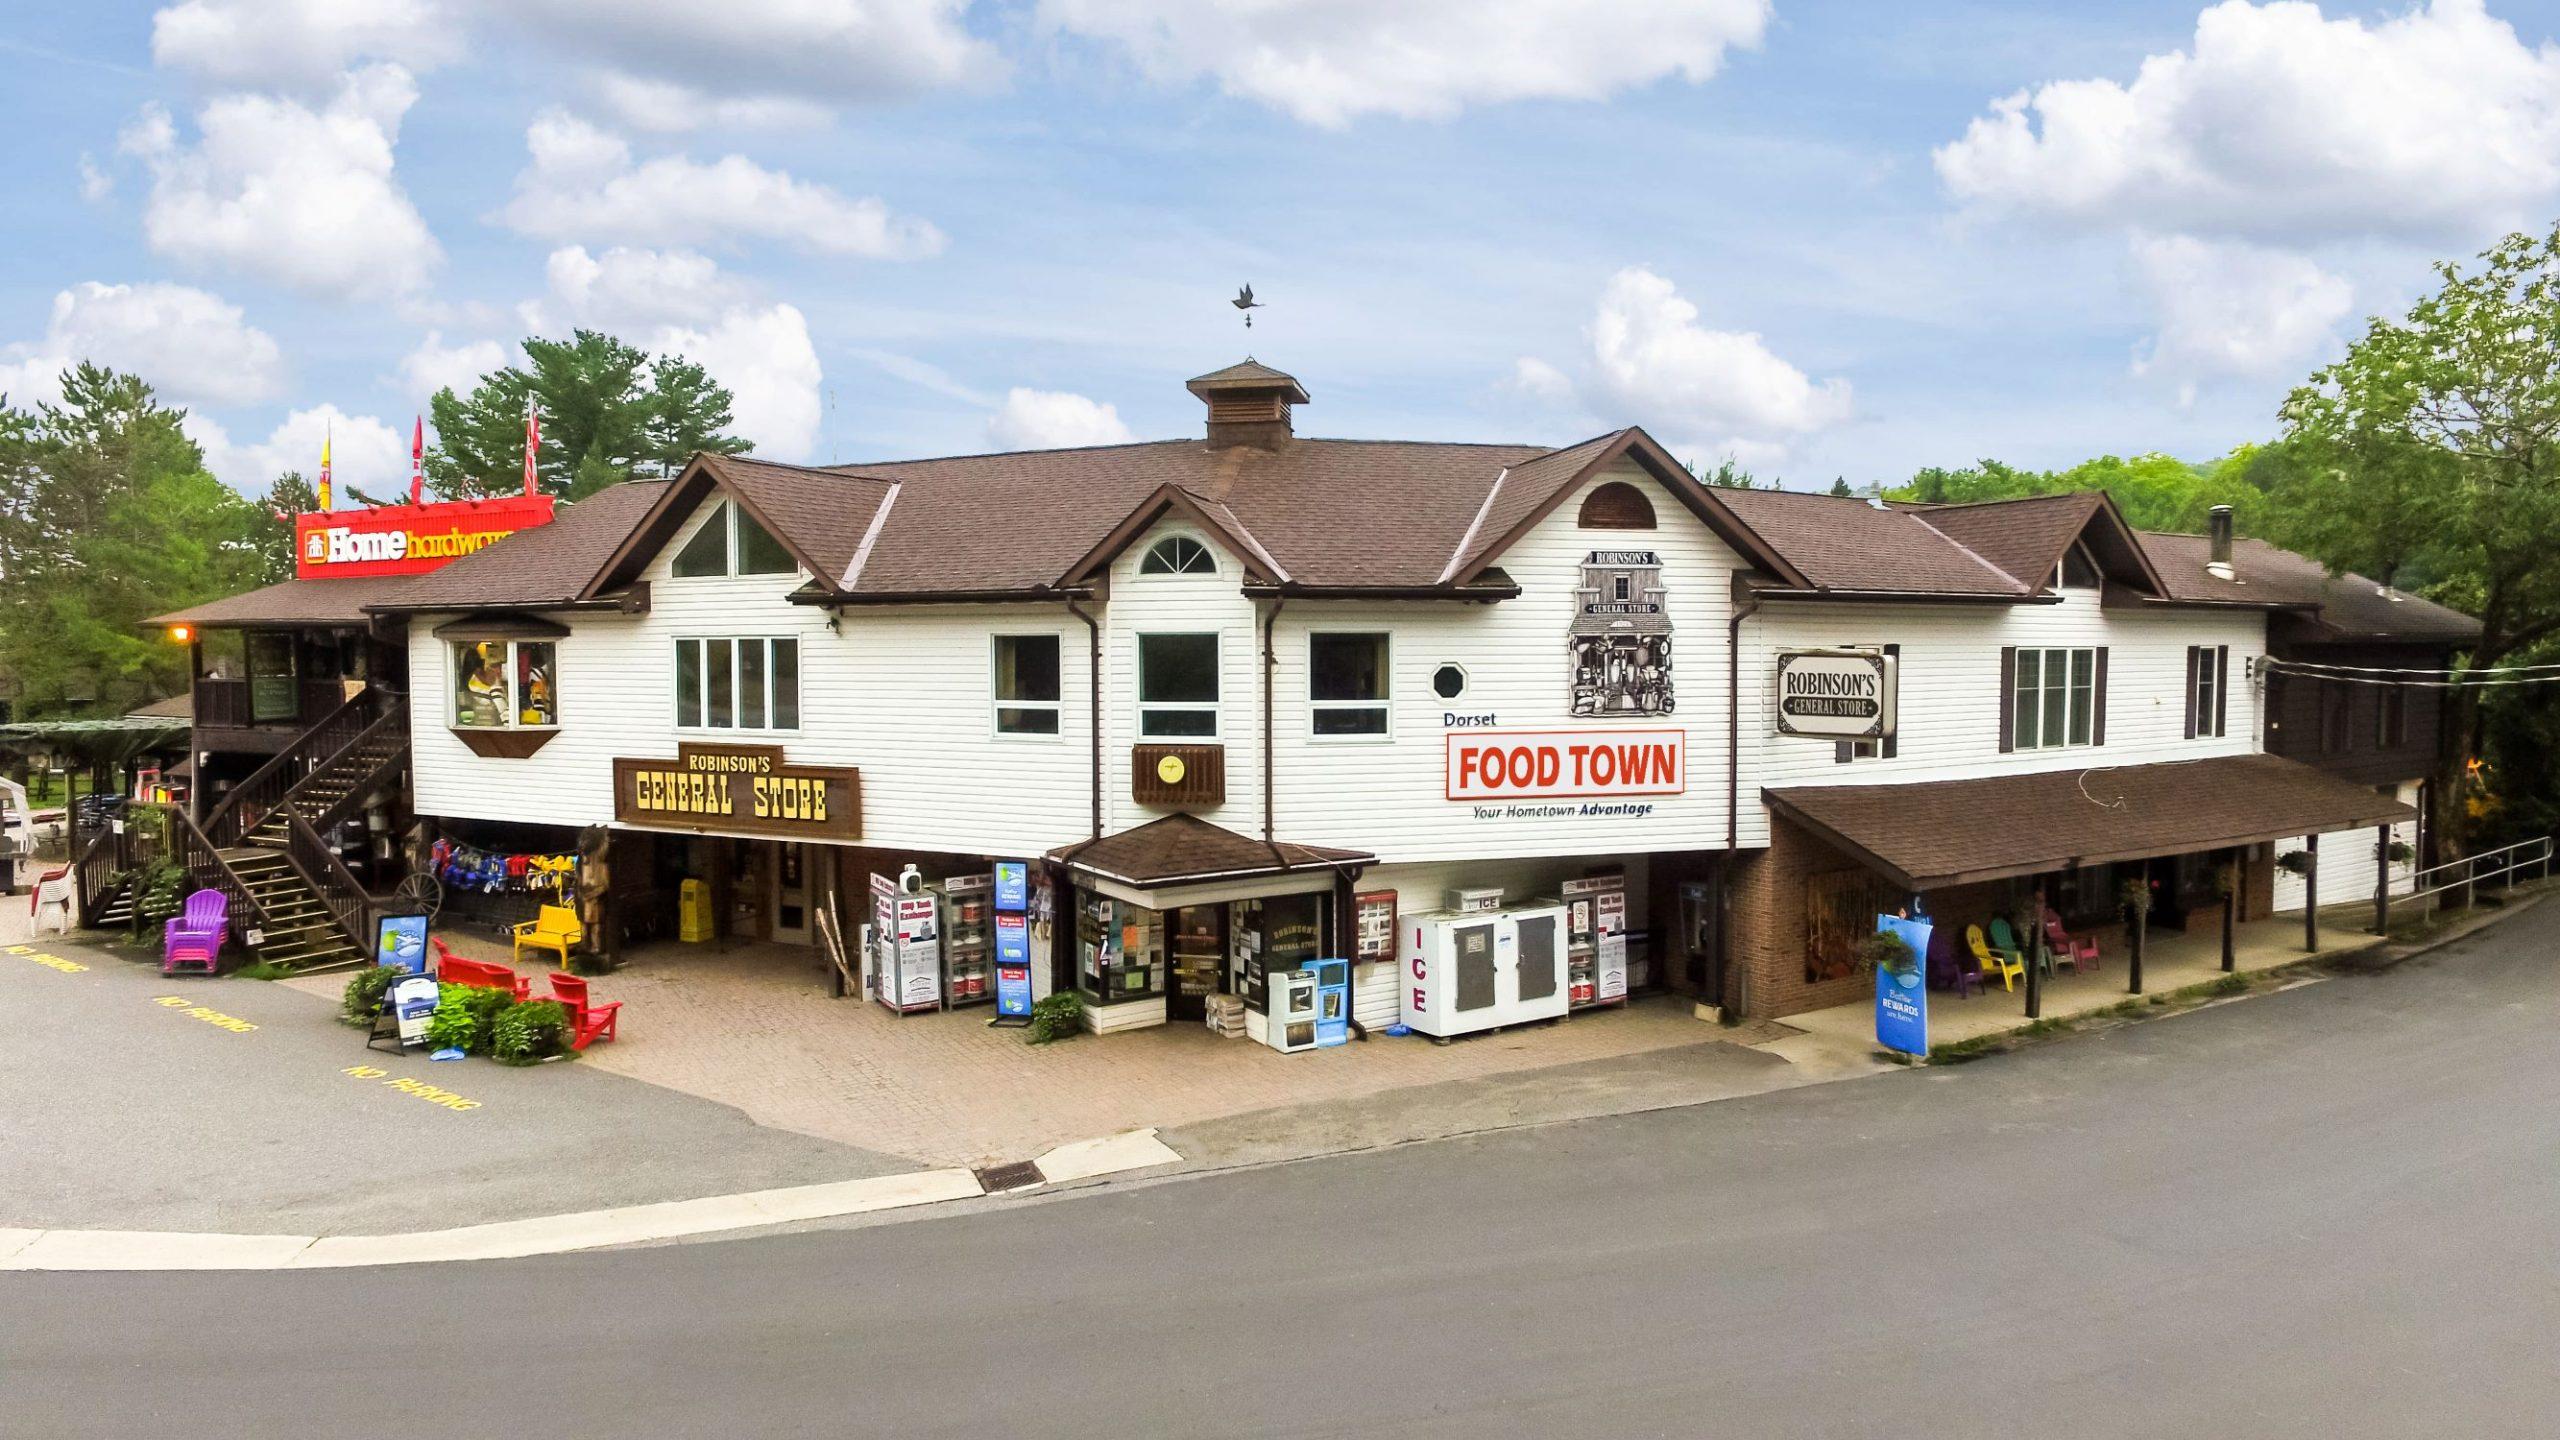 #MBWShoutOuts Week 15: Robinson's General Store